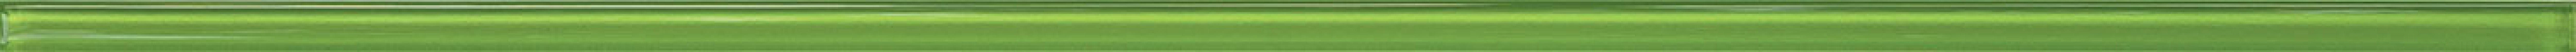 Бордюр Tubadzin Dots Green 74.8x1.5